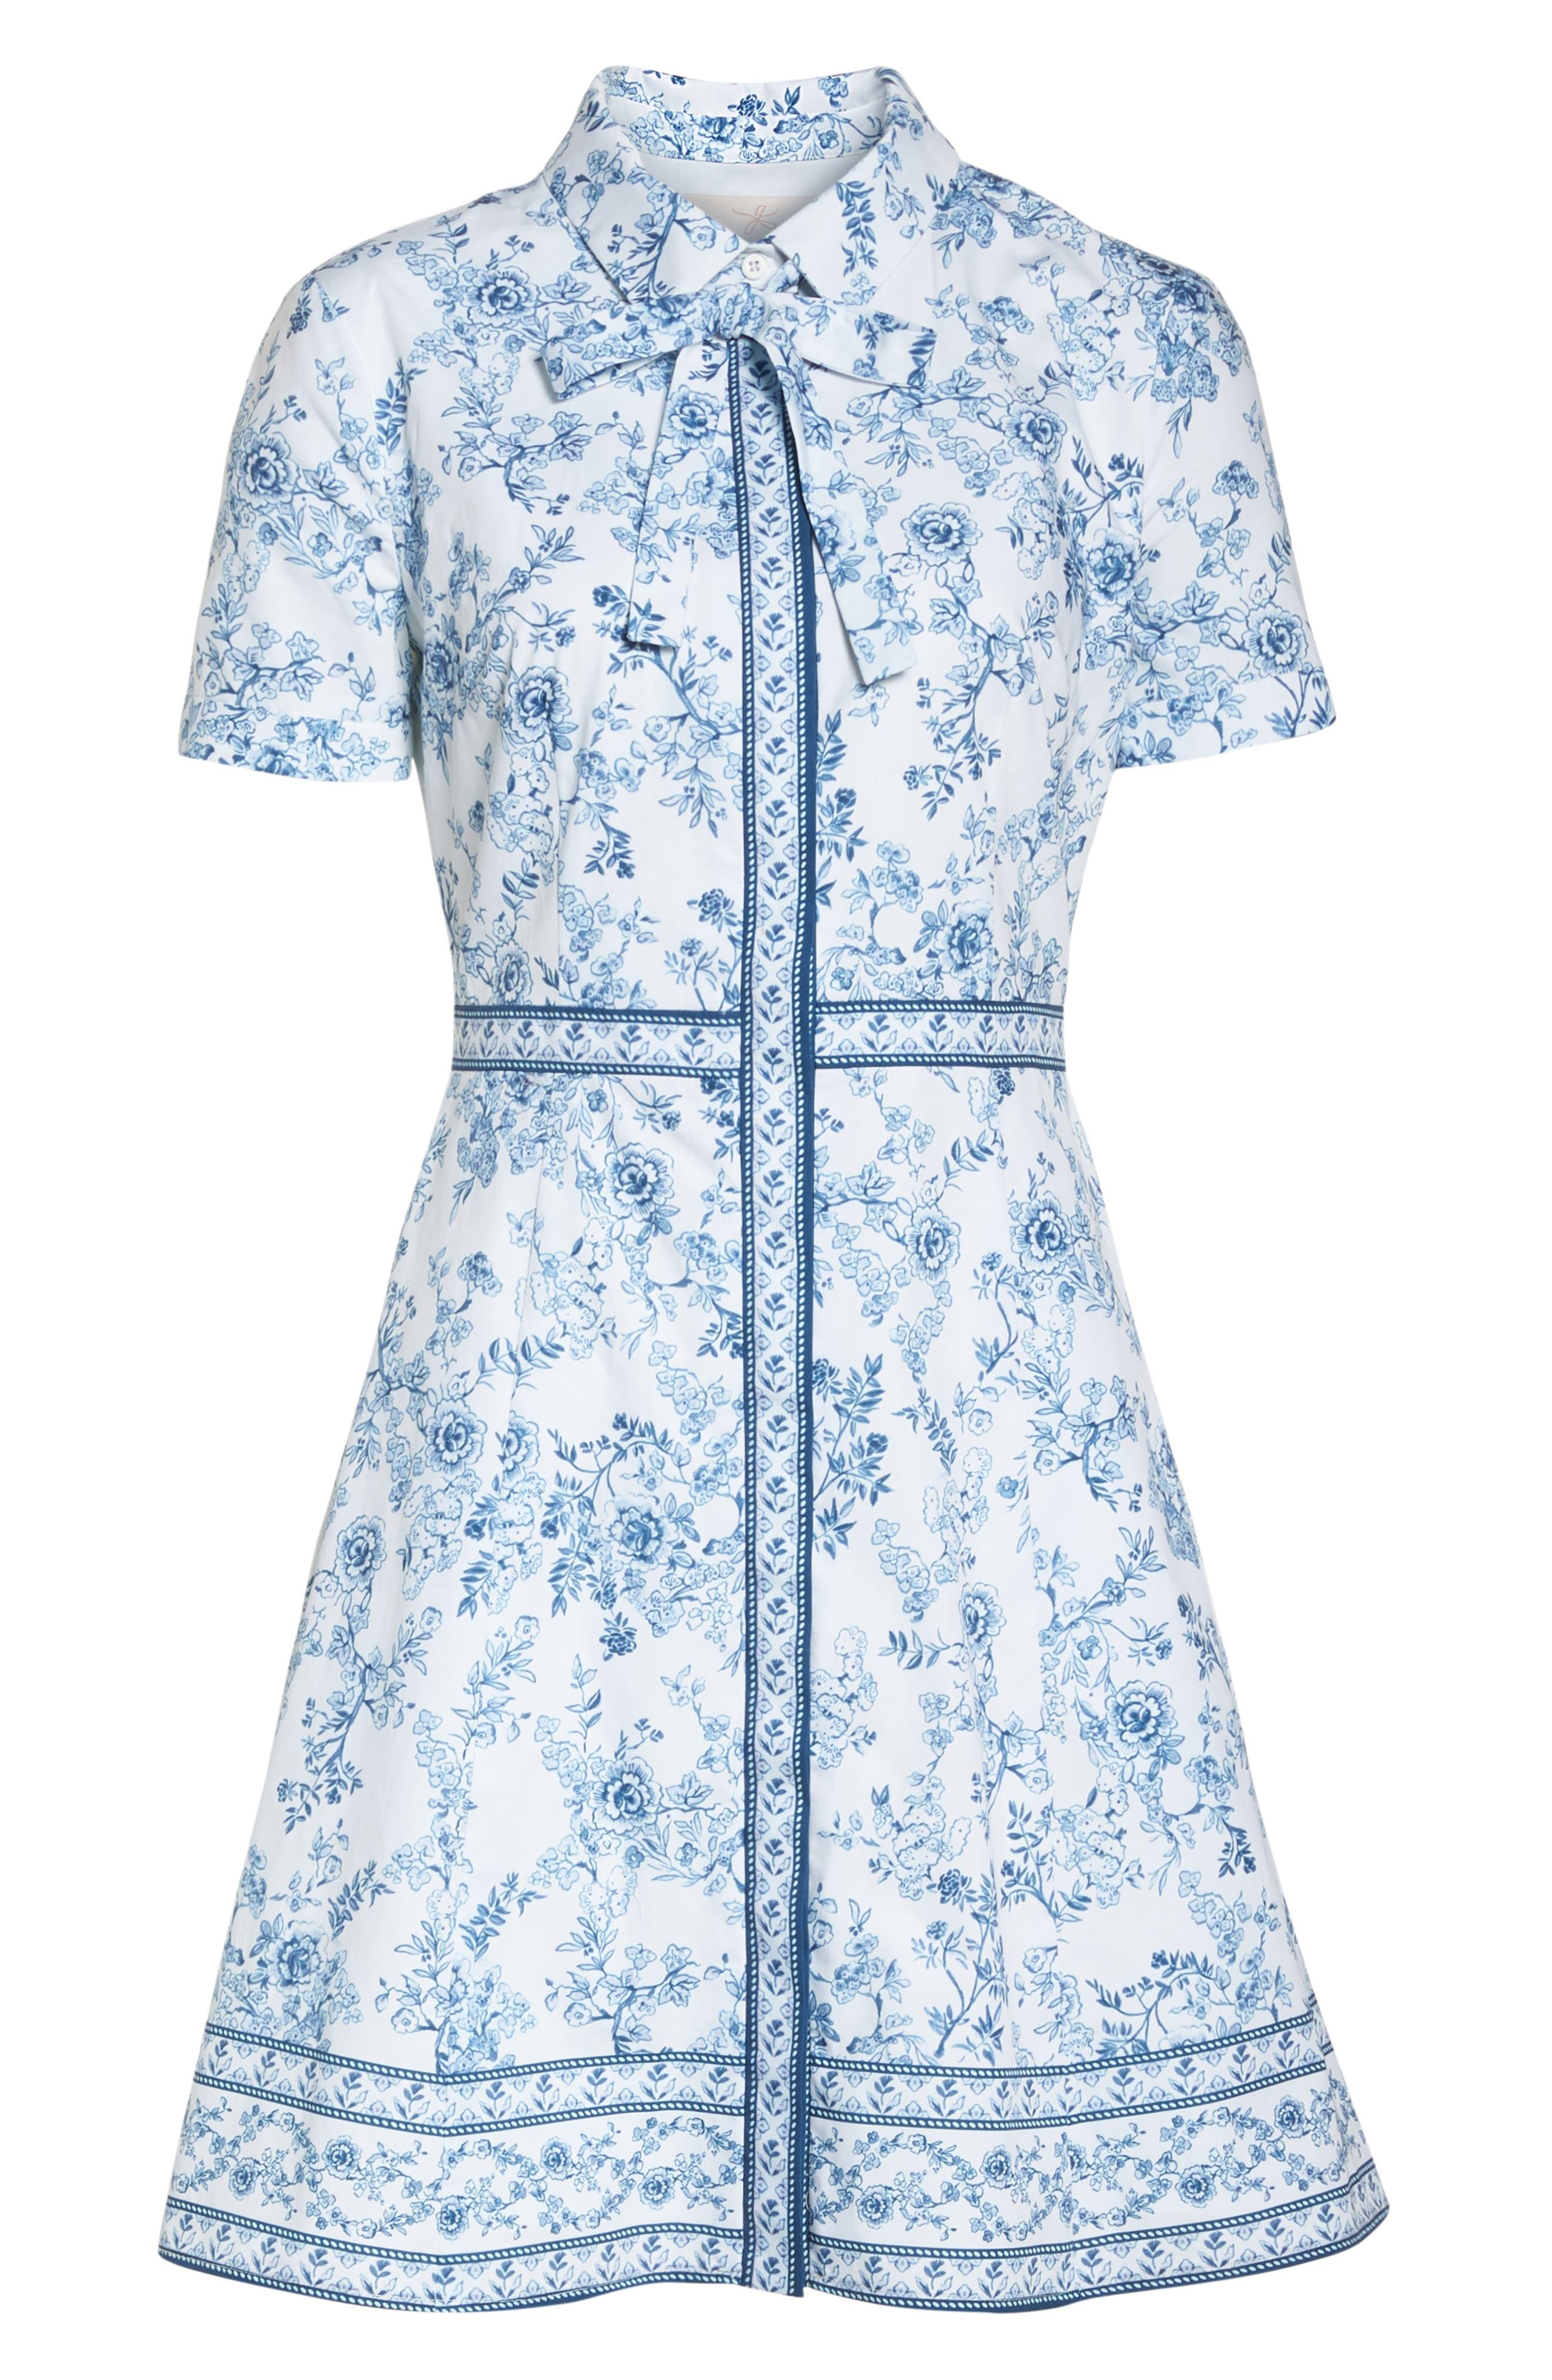 Darla Cotton Toile Shirtdress,                             Alternate thumbnail 7, color,                             415